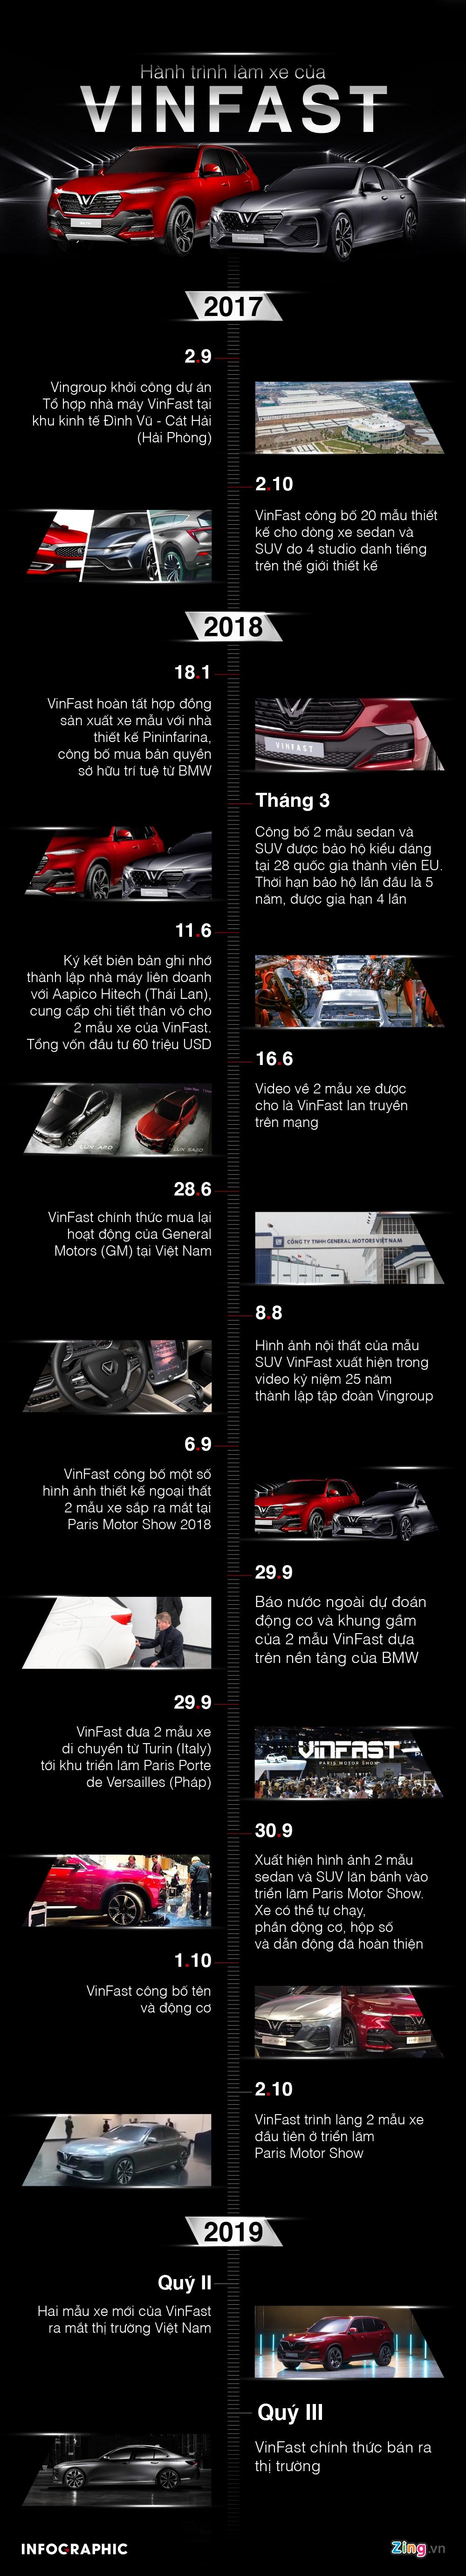 Infographic: Hanh trinh ra mat oto trong 13 thang cua VinFast hinh anh 1